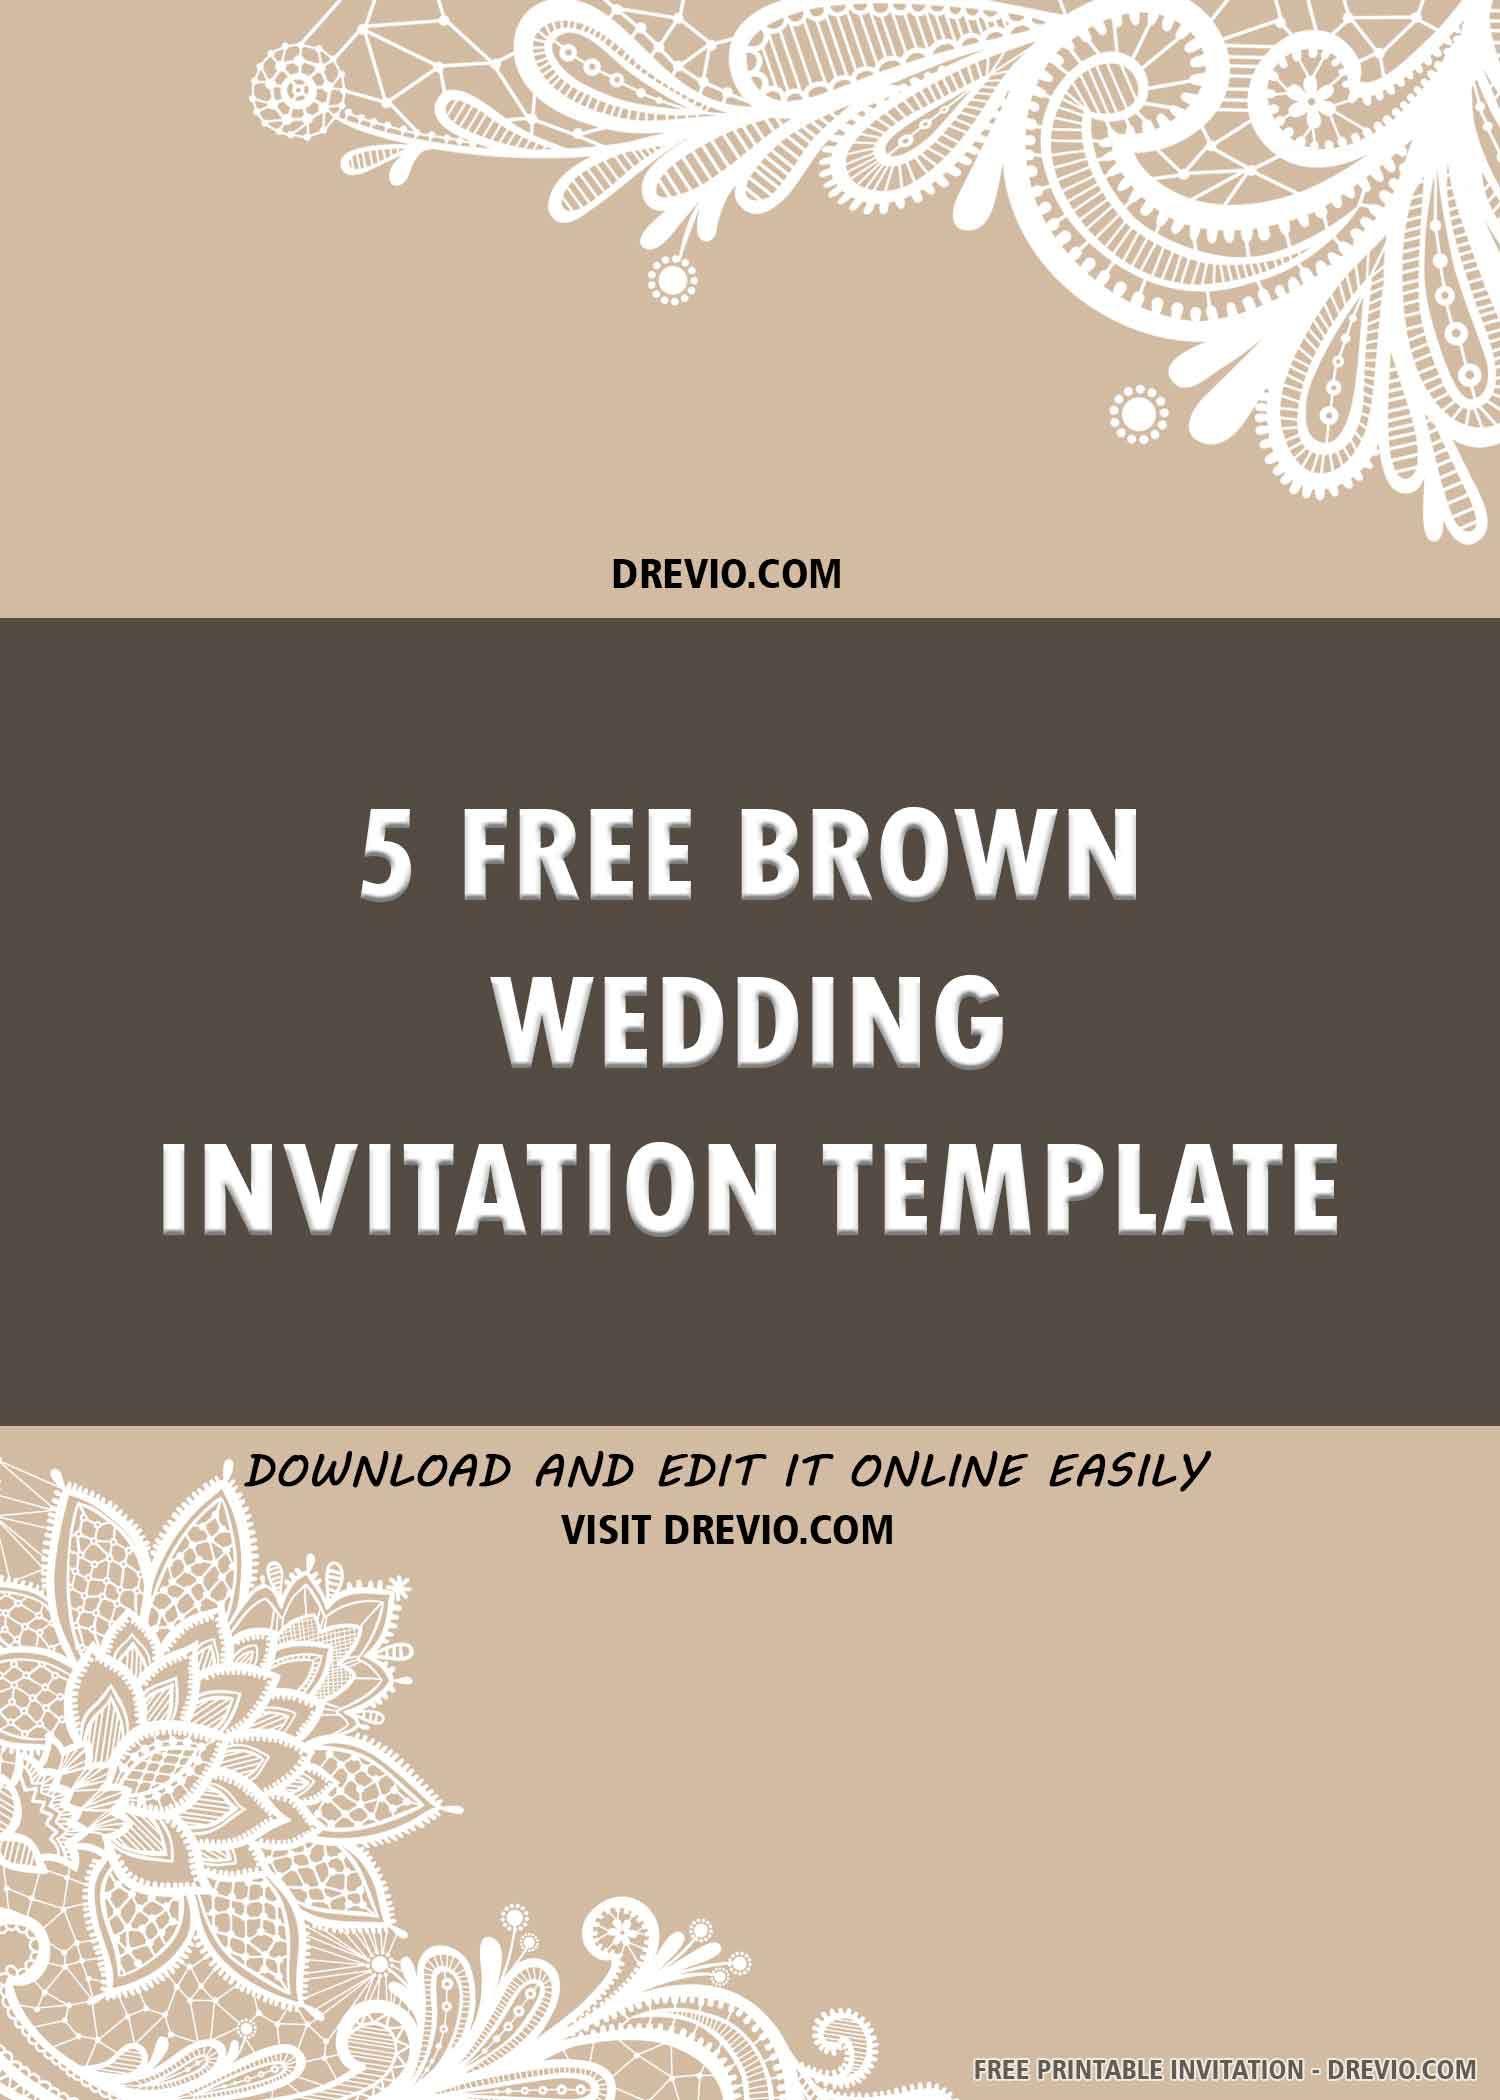 005 Surprising Free Wedding Invitation Template Printable Idea  For Microsoft Word MacFull